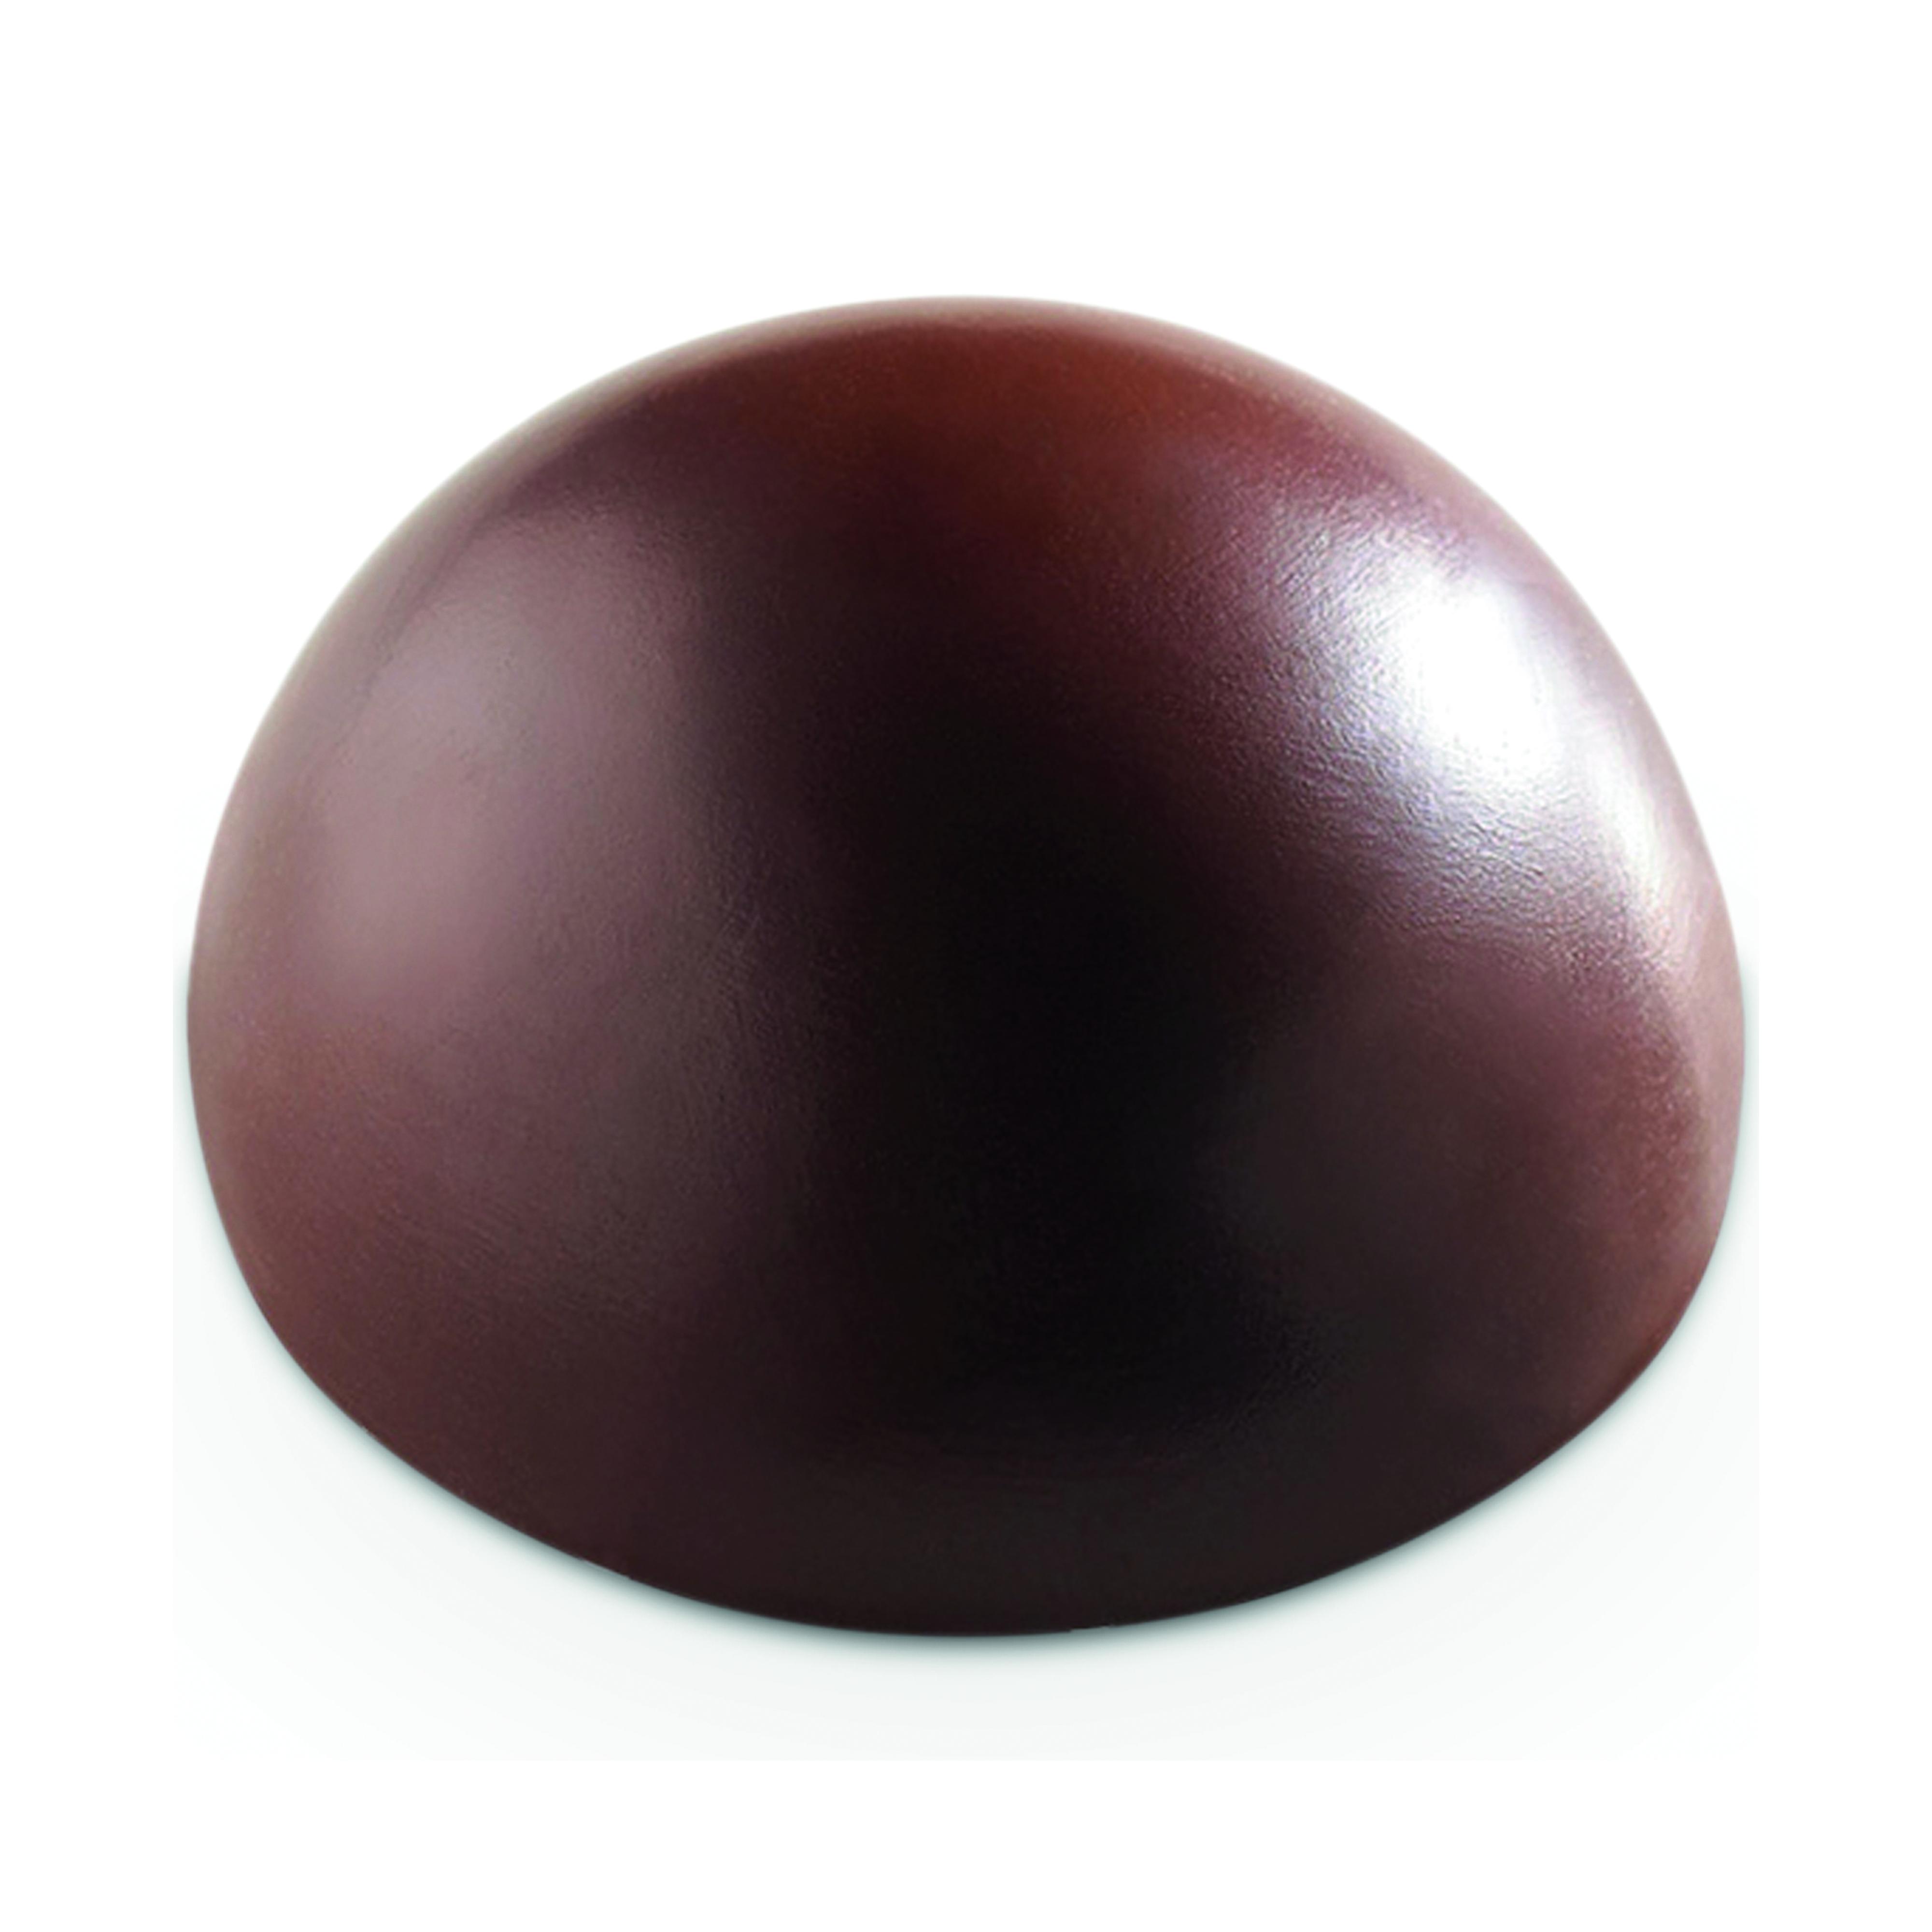 'Demi-sphère' chocolate bonbon mold